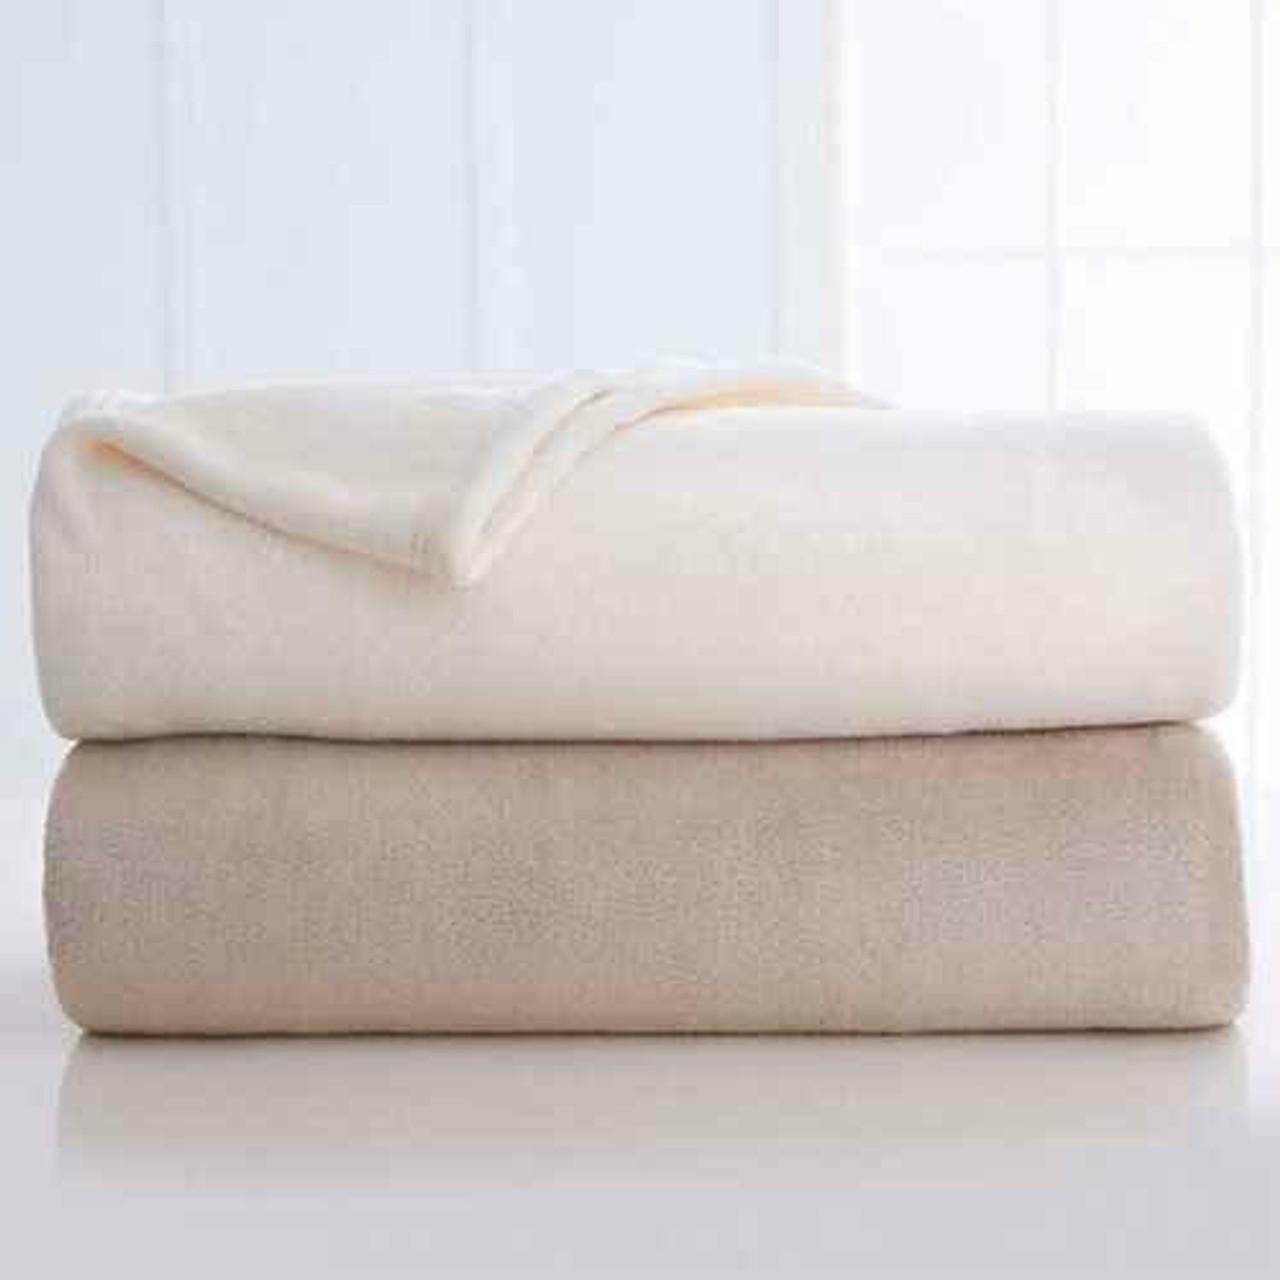 WestPoint/Martex Westpoint or Martex Plush or extraordinary spa quality softness